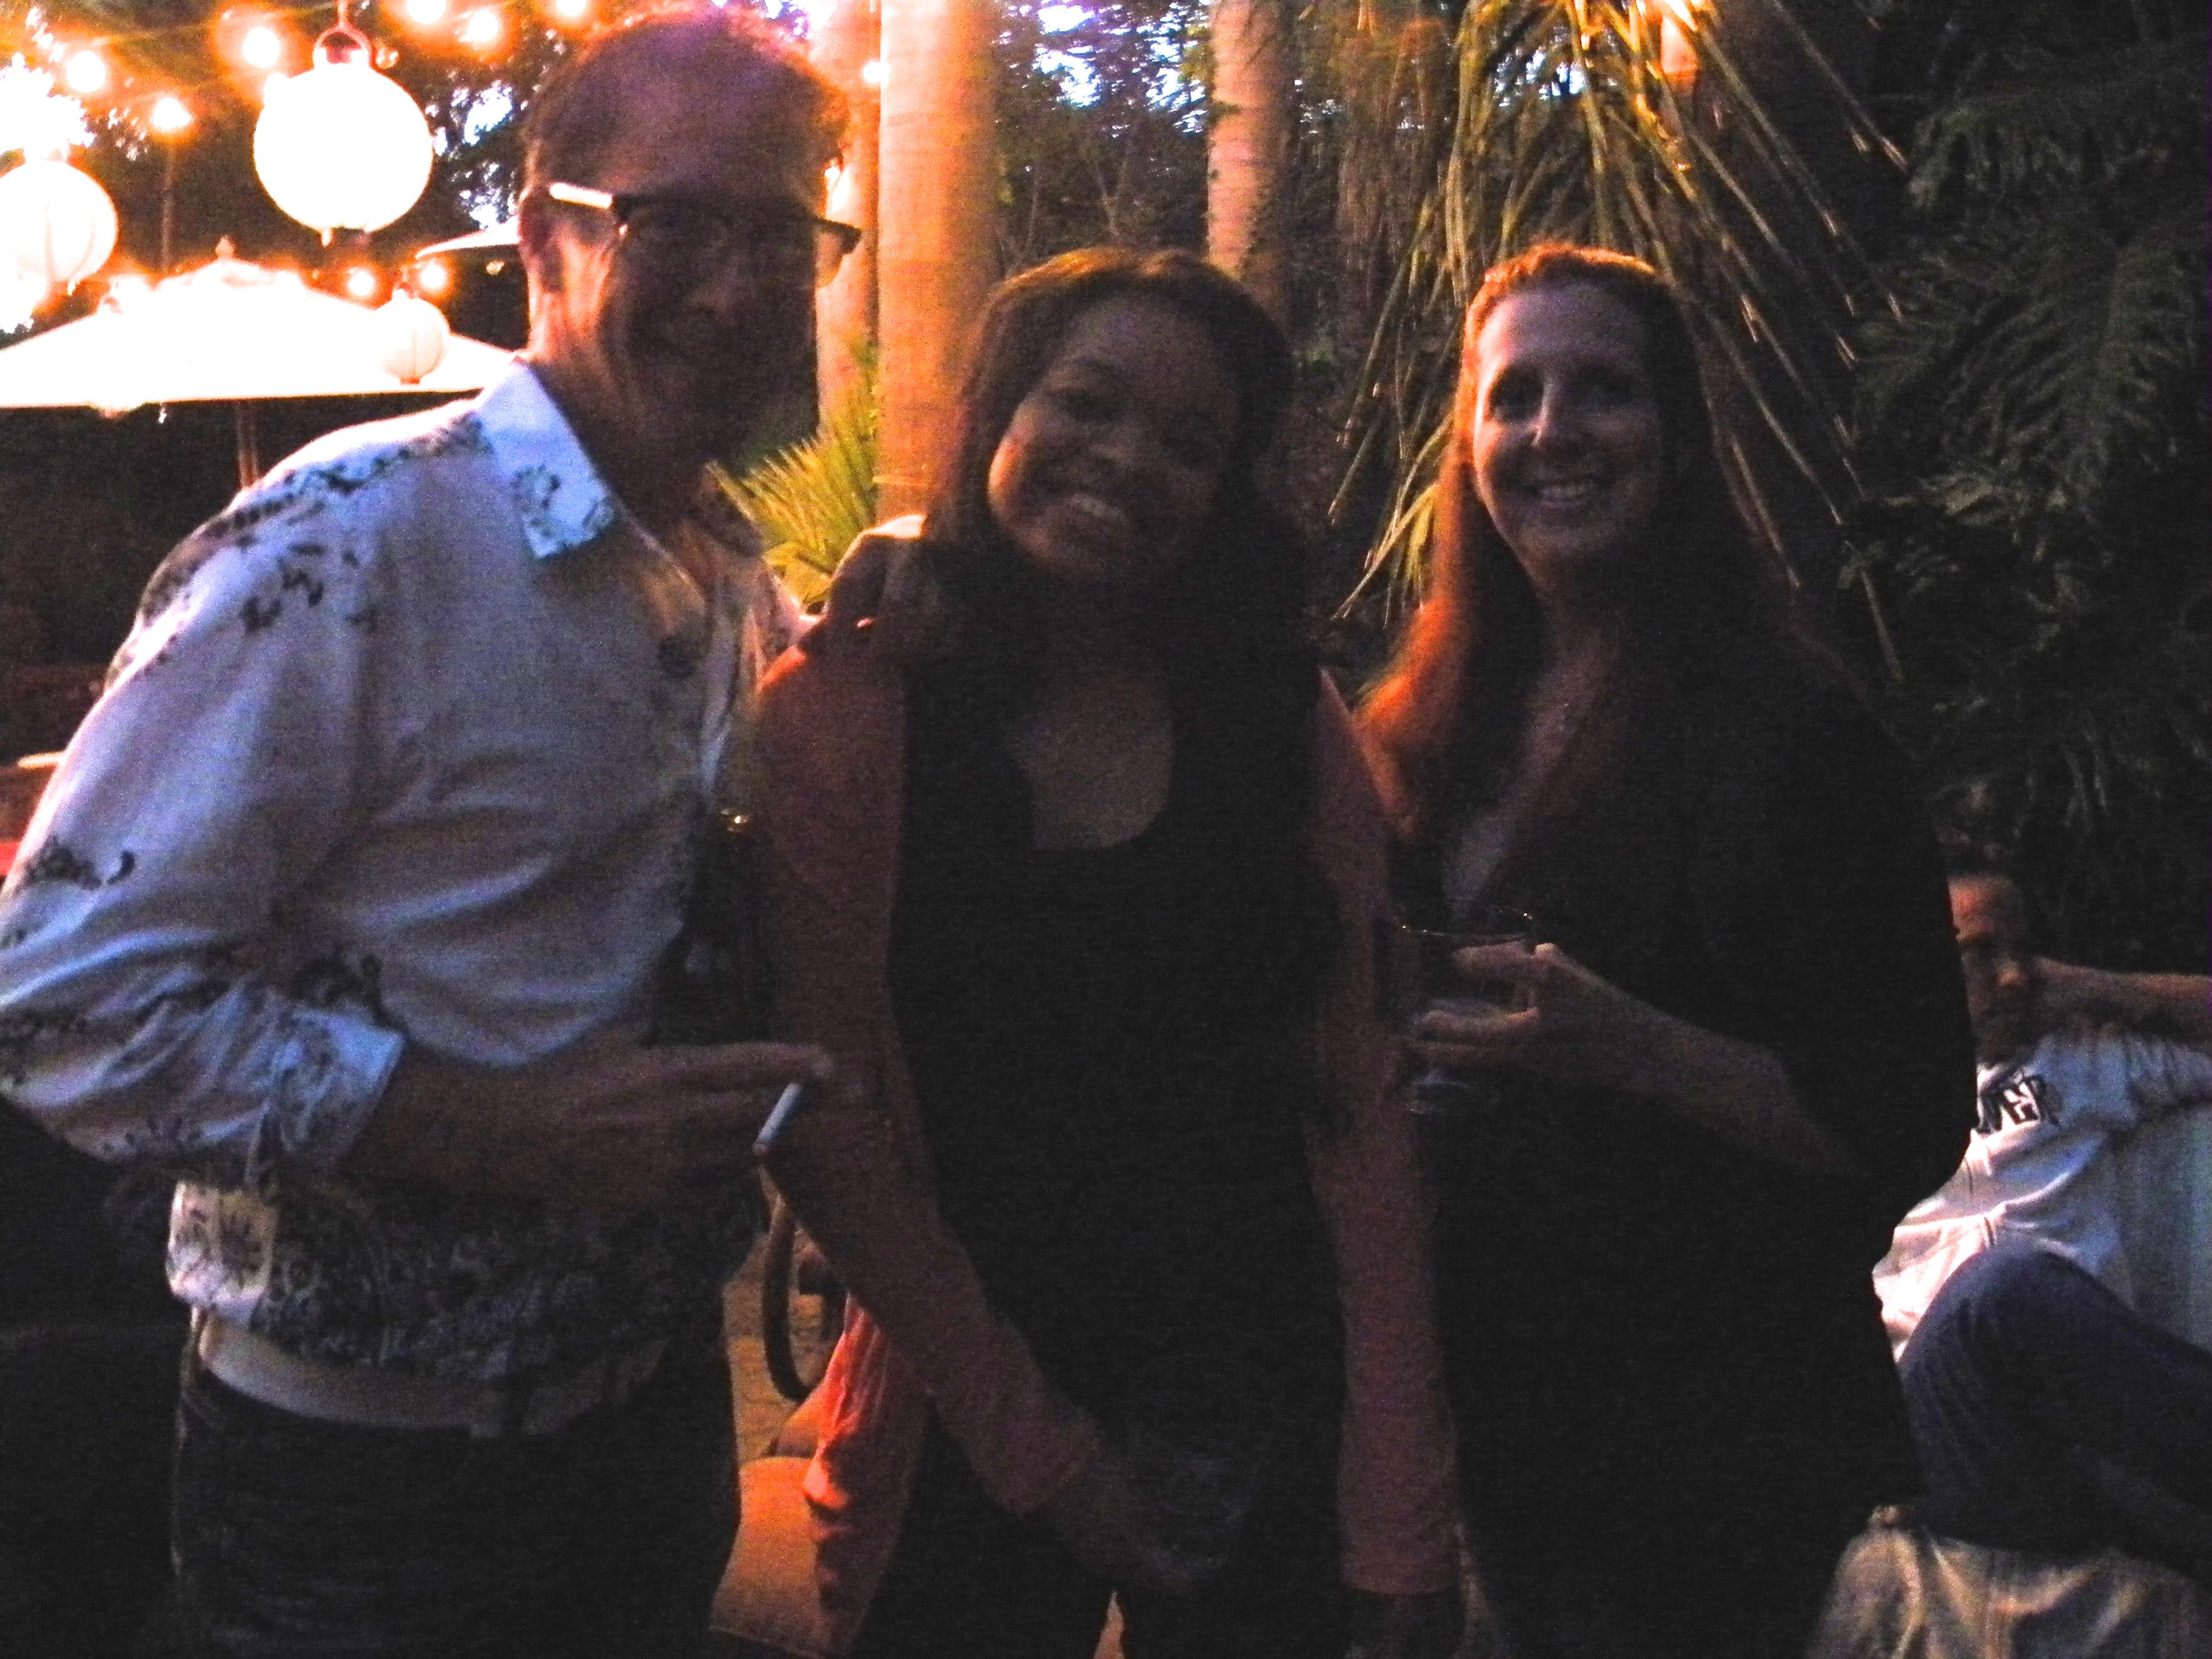 Thomas, Stephanie and Marianne